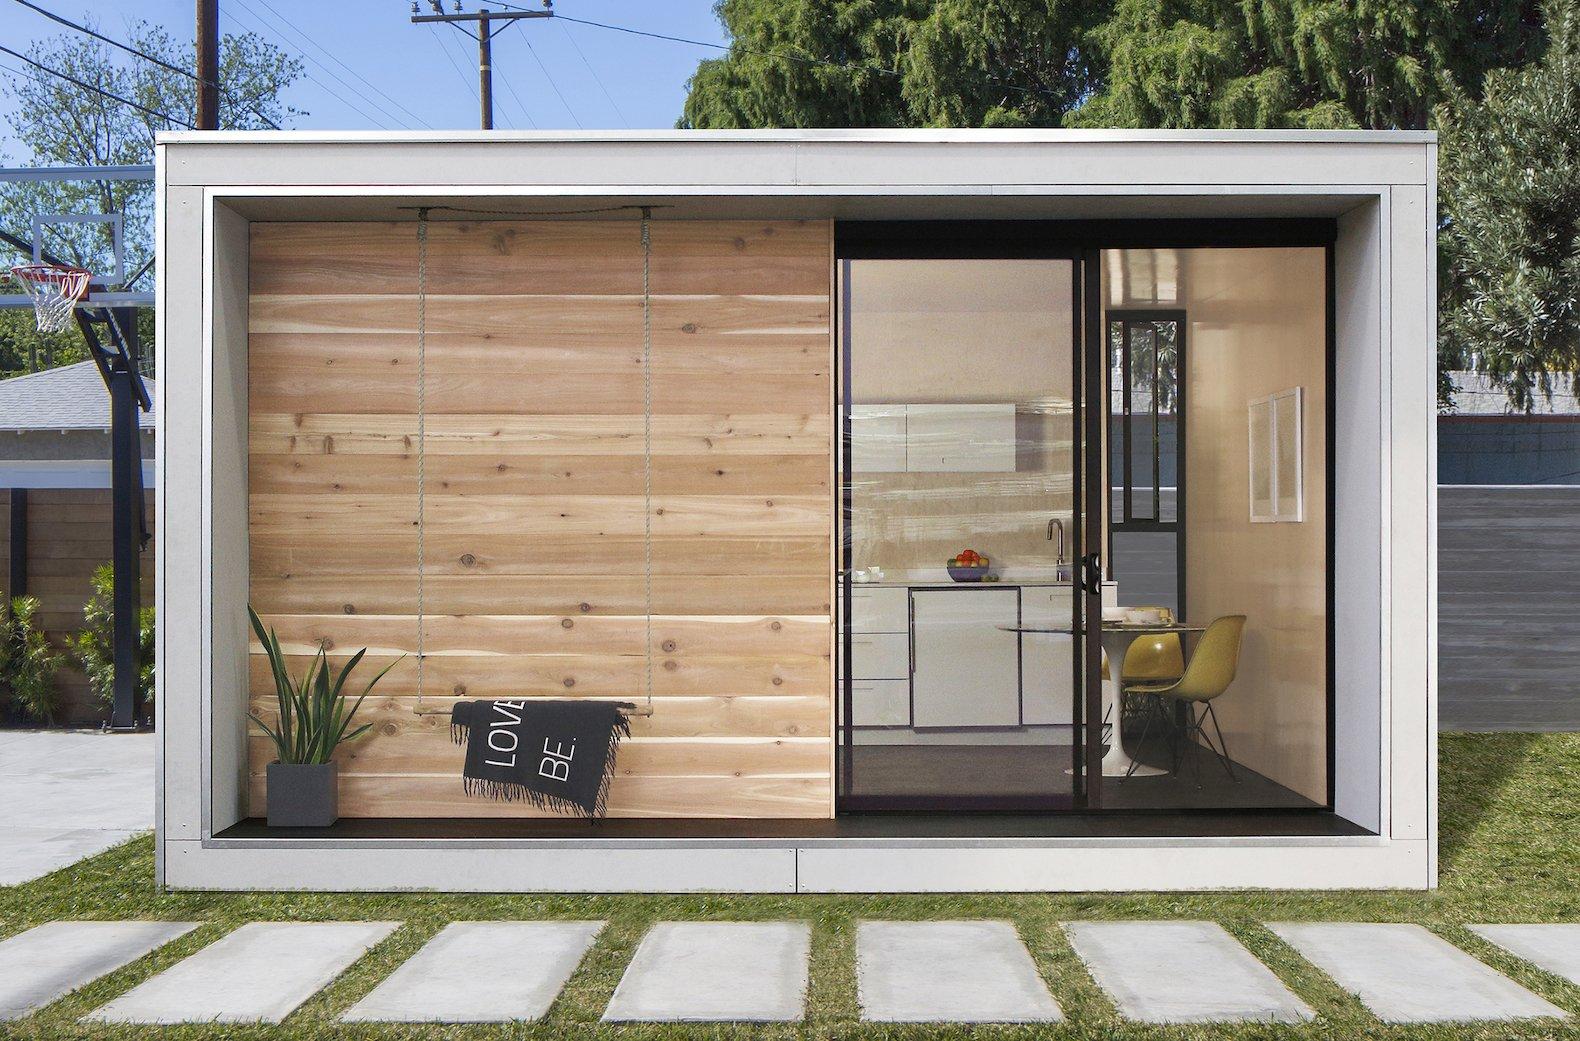 6 Prefab Companies Ready to Build Your New Backyard Office ...